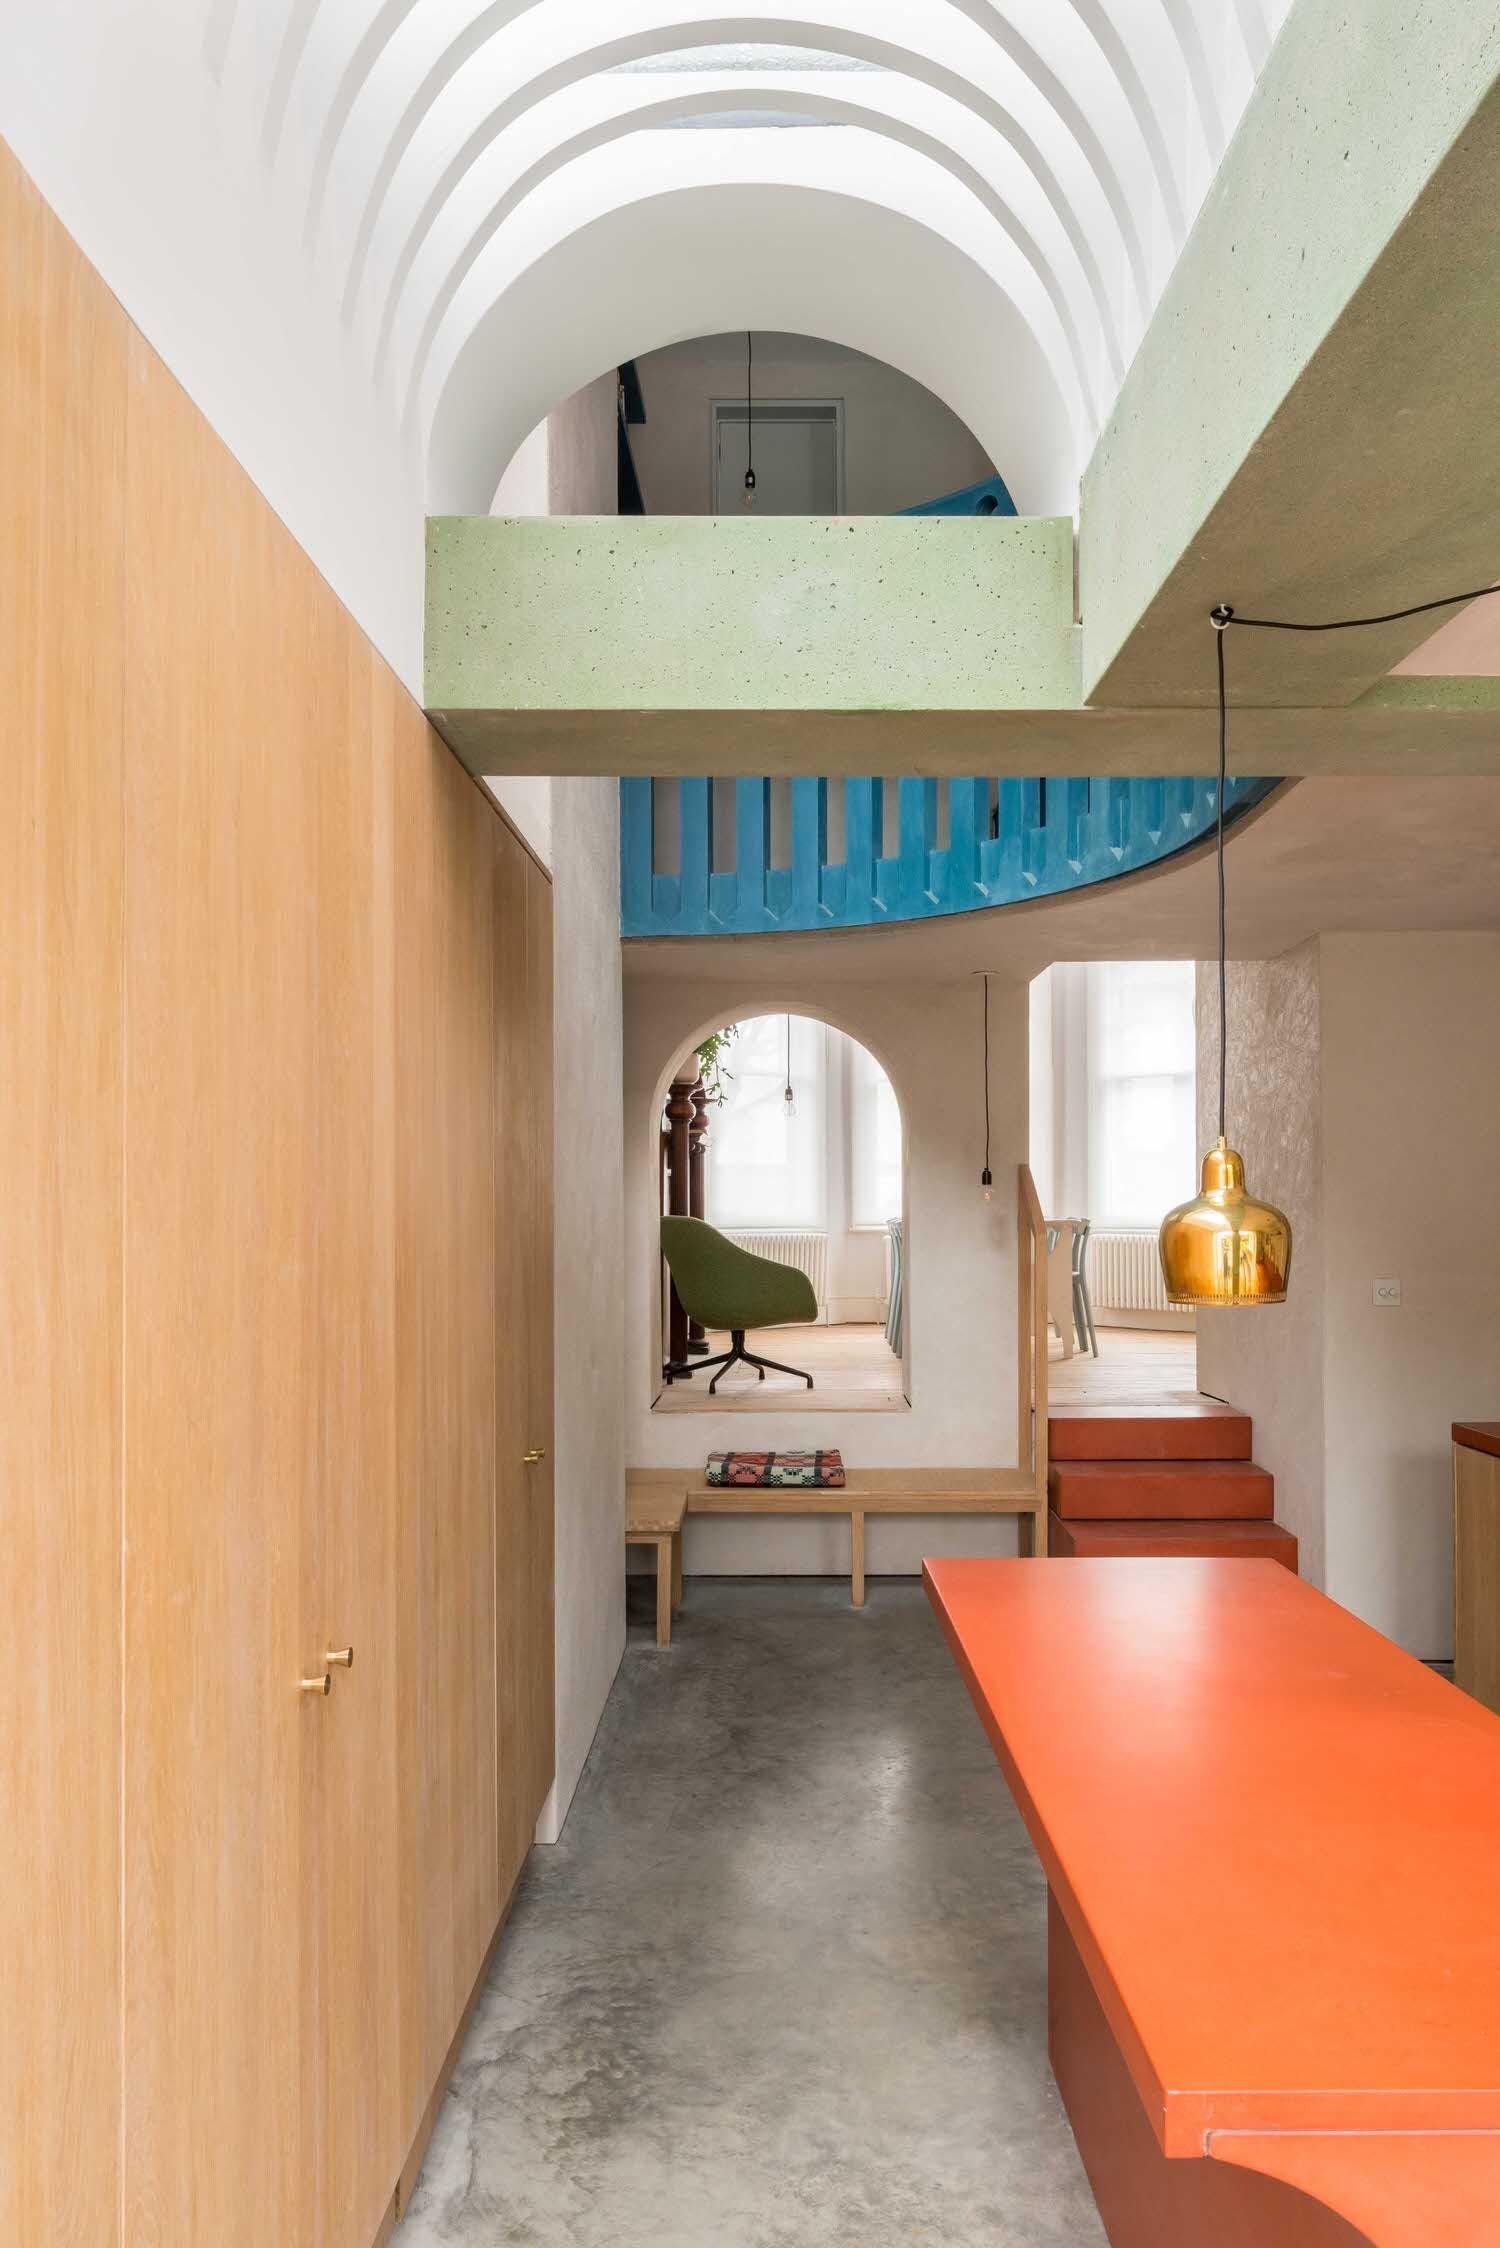 Studio Ben Allen House Recast London Residential Architecture Photo French+tye Yellowtrace 21